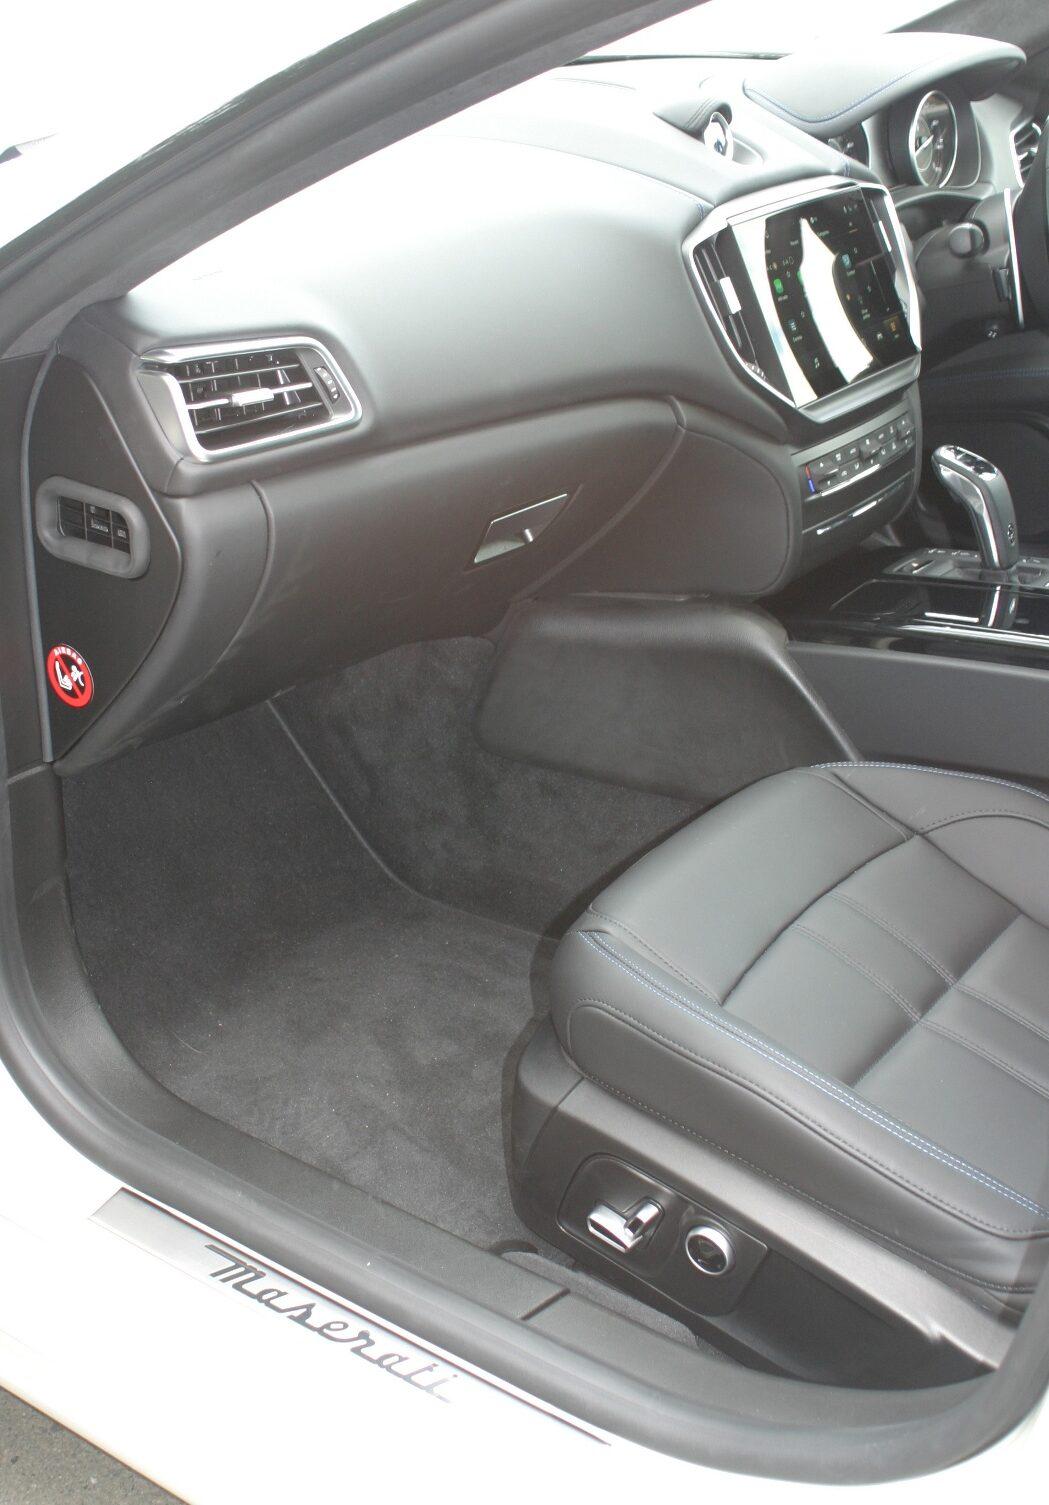 Maserati Ghibli Hybrid passenger seat